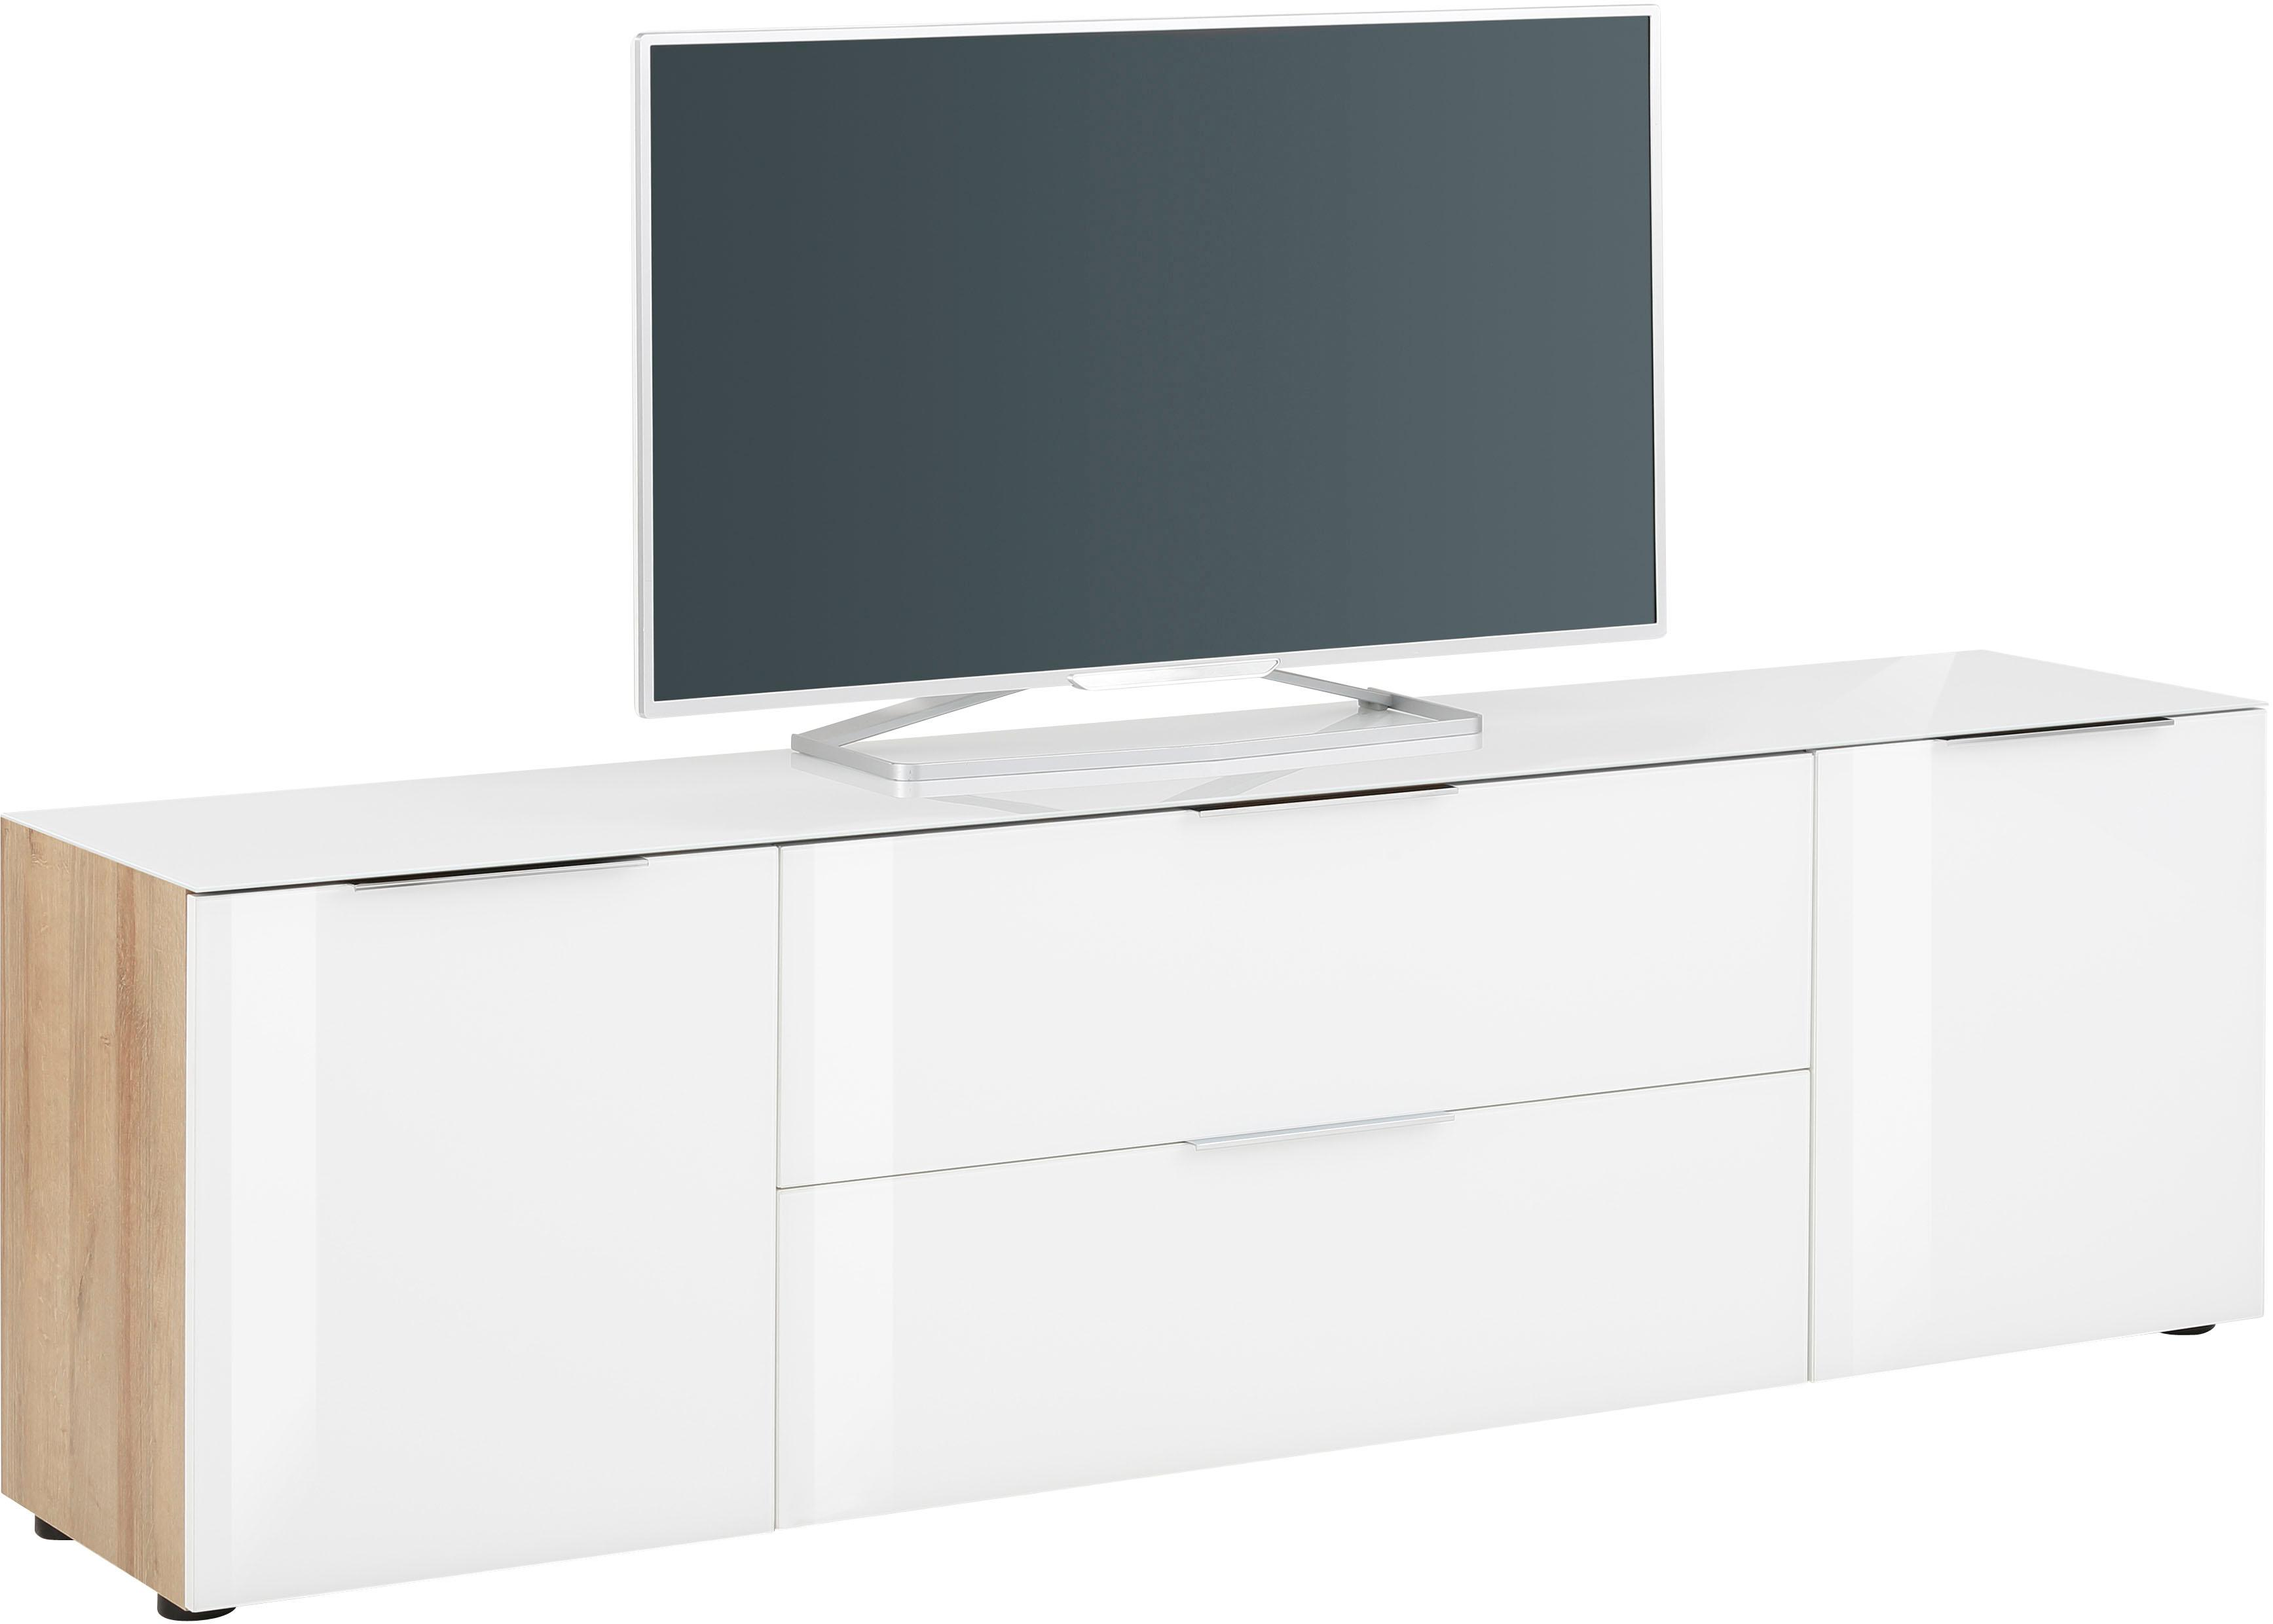 Maja Möbel Lowboard »7822 TREND« günstig online kaufen